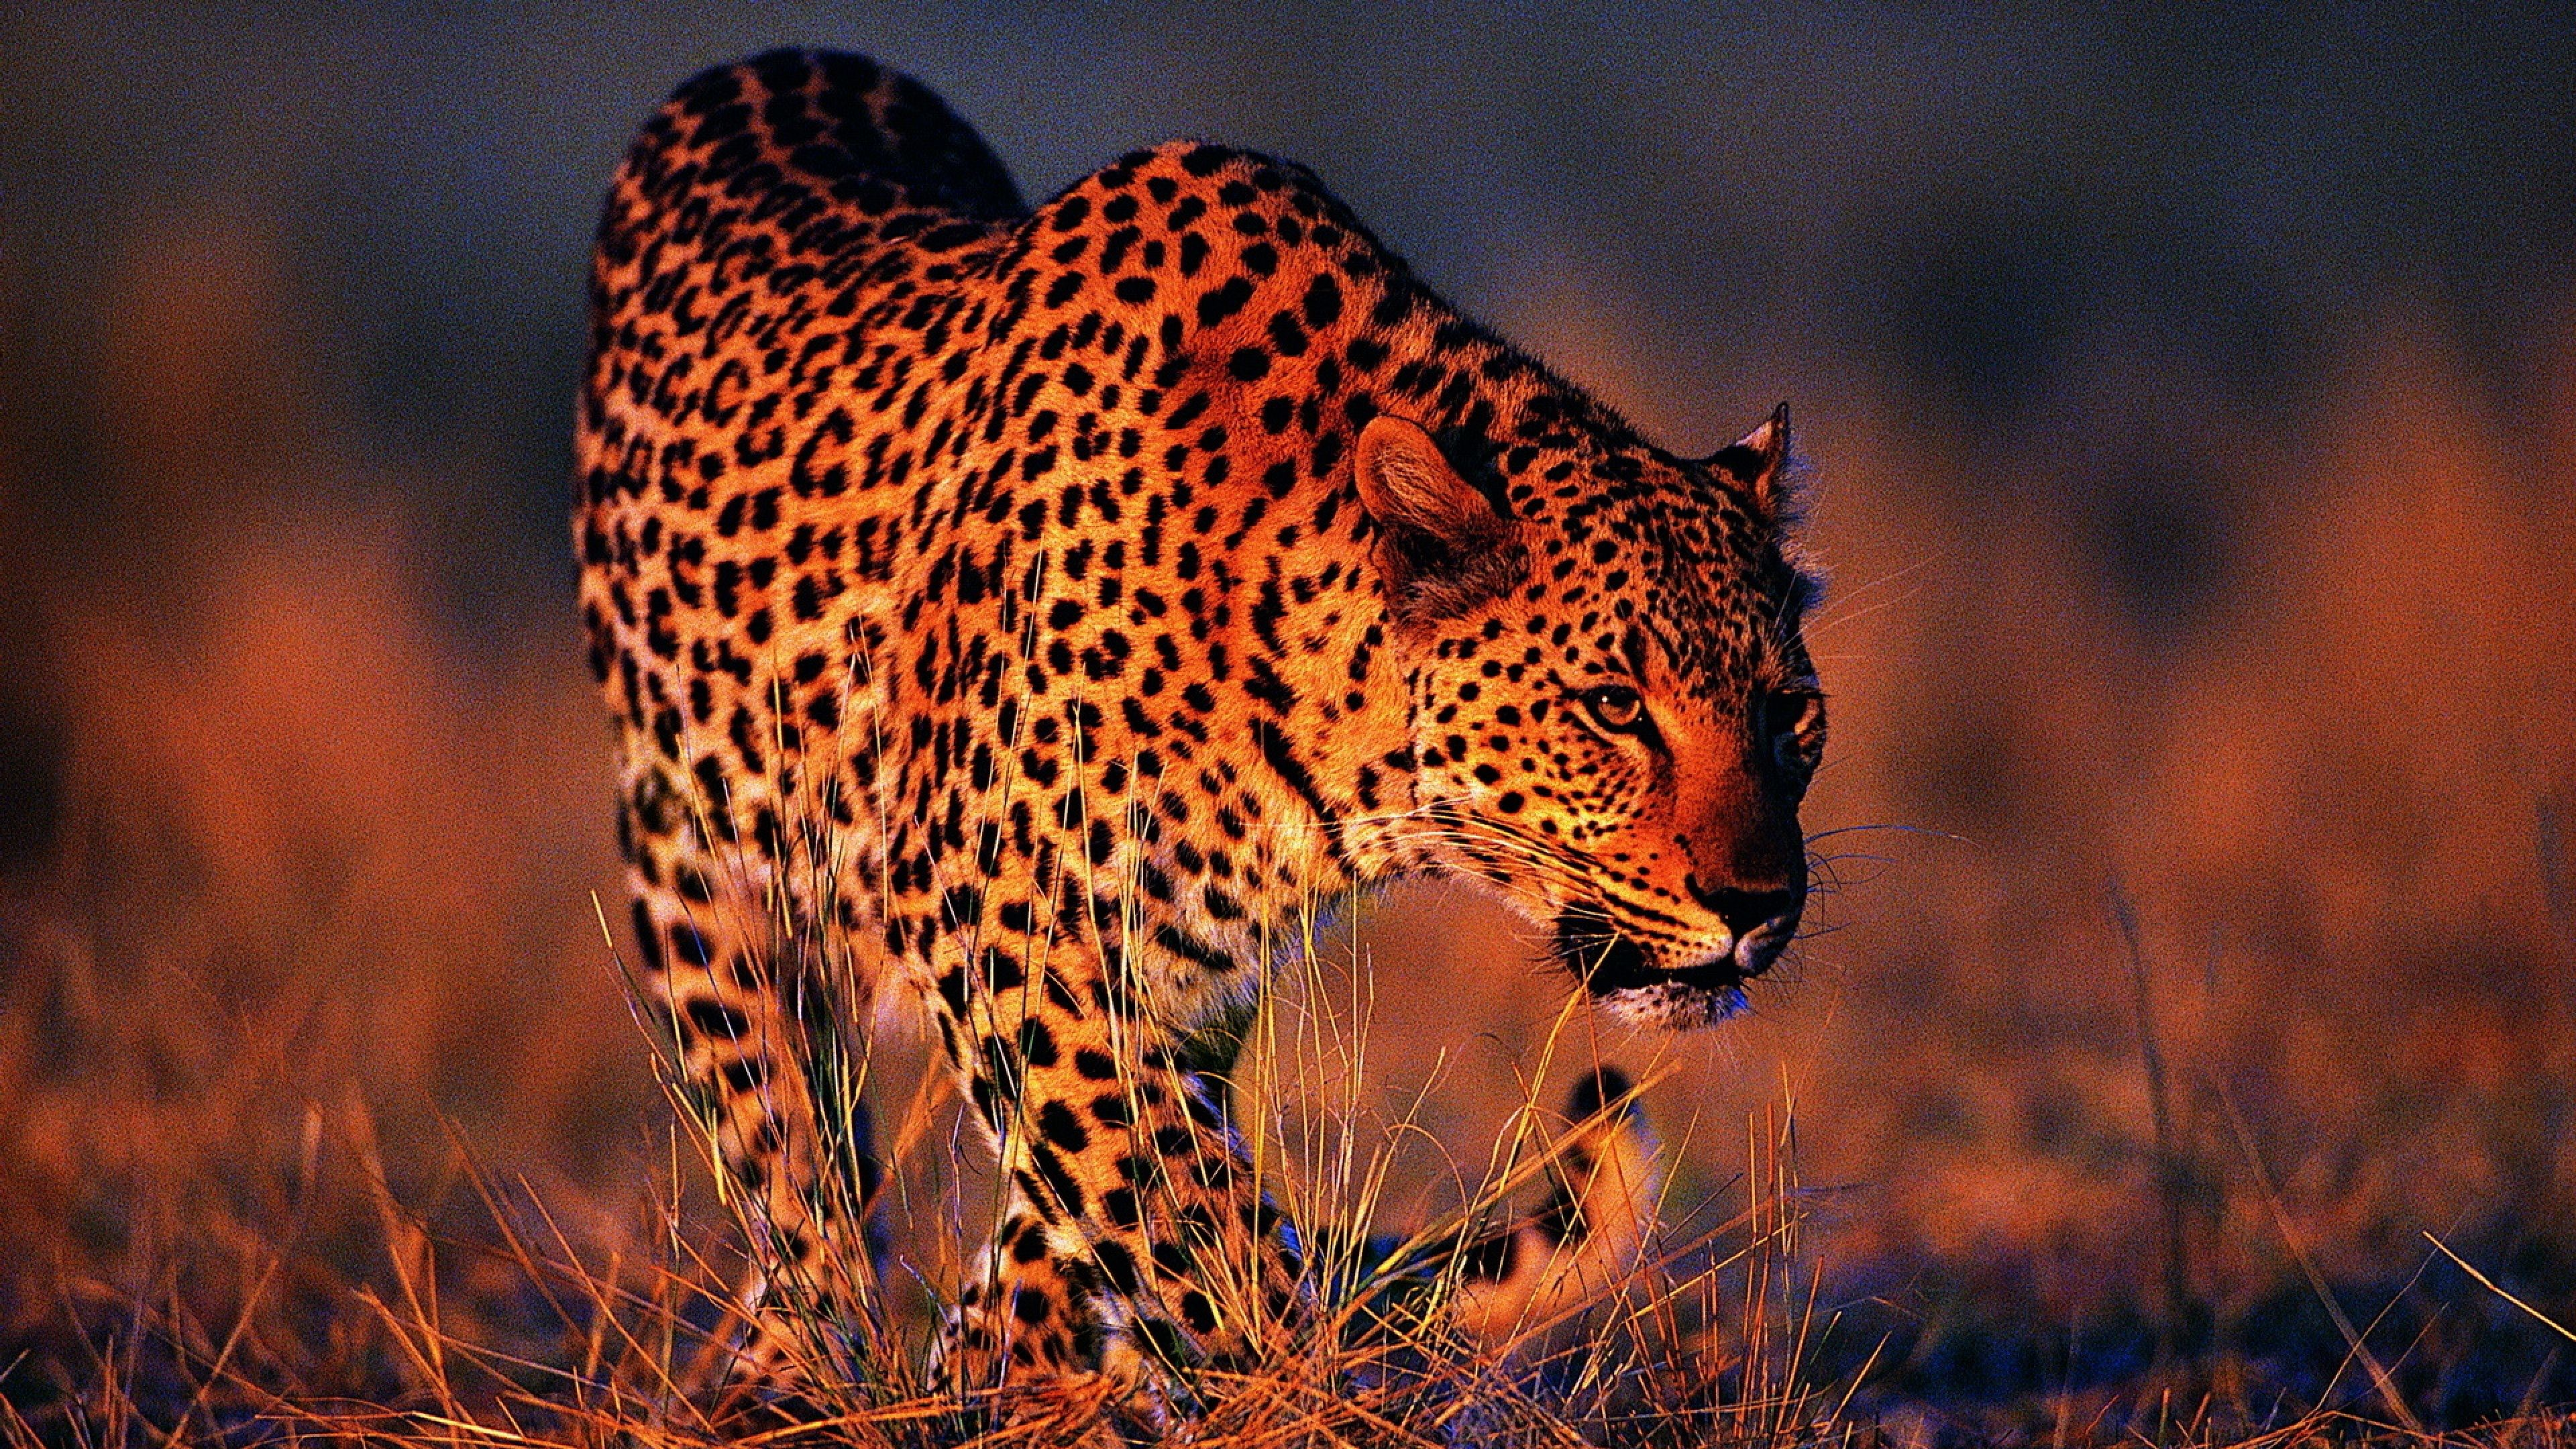 leopard wallpapers 183��